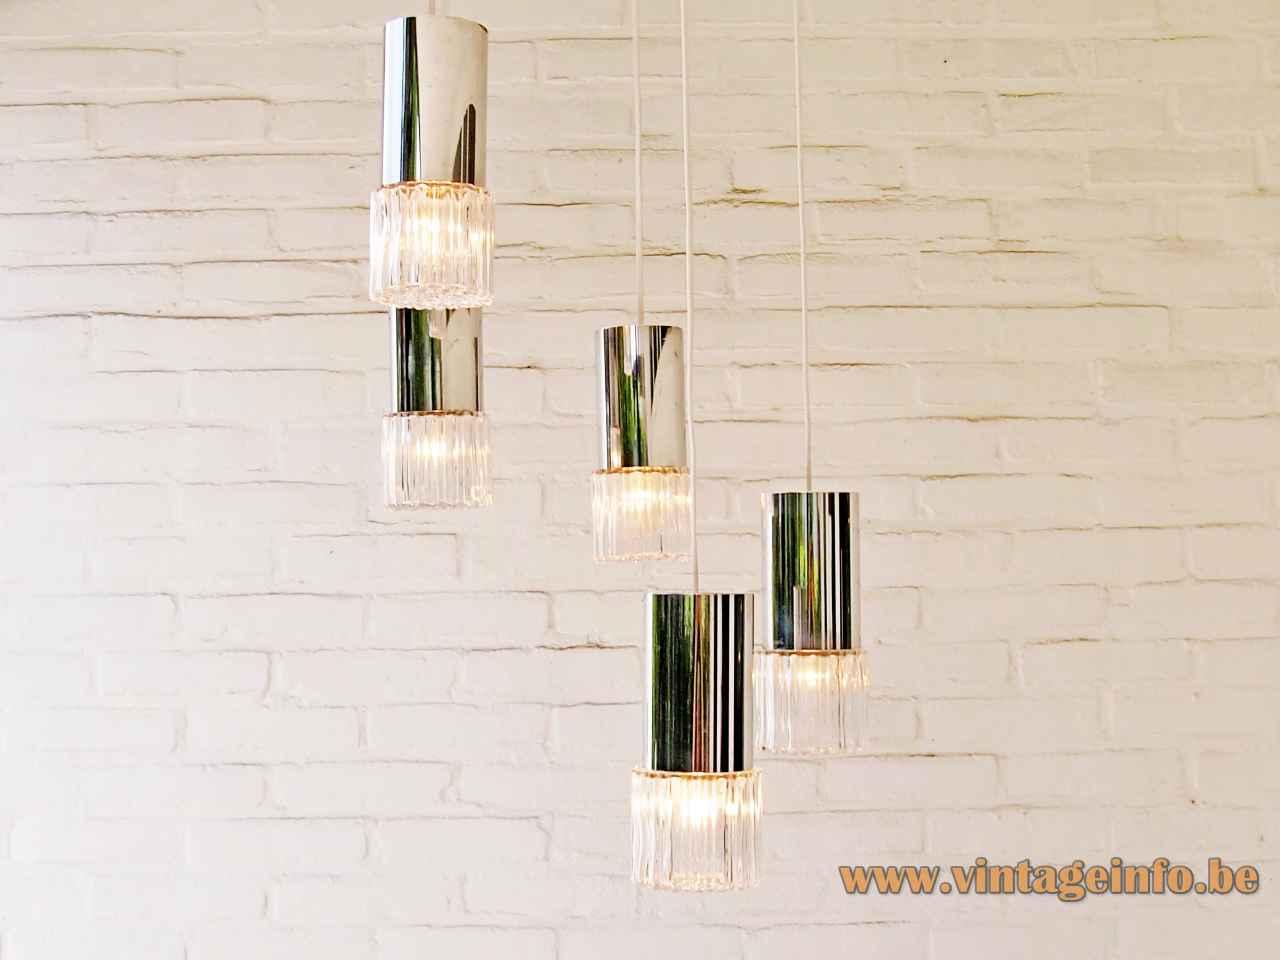 One Vintage Chrome//Glass Wall Light//Sconce 3 pcs avail. KALMAR prob